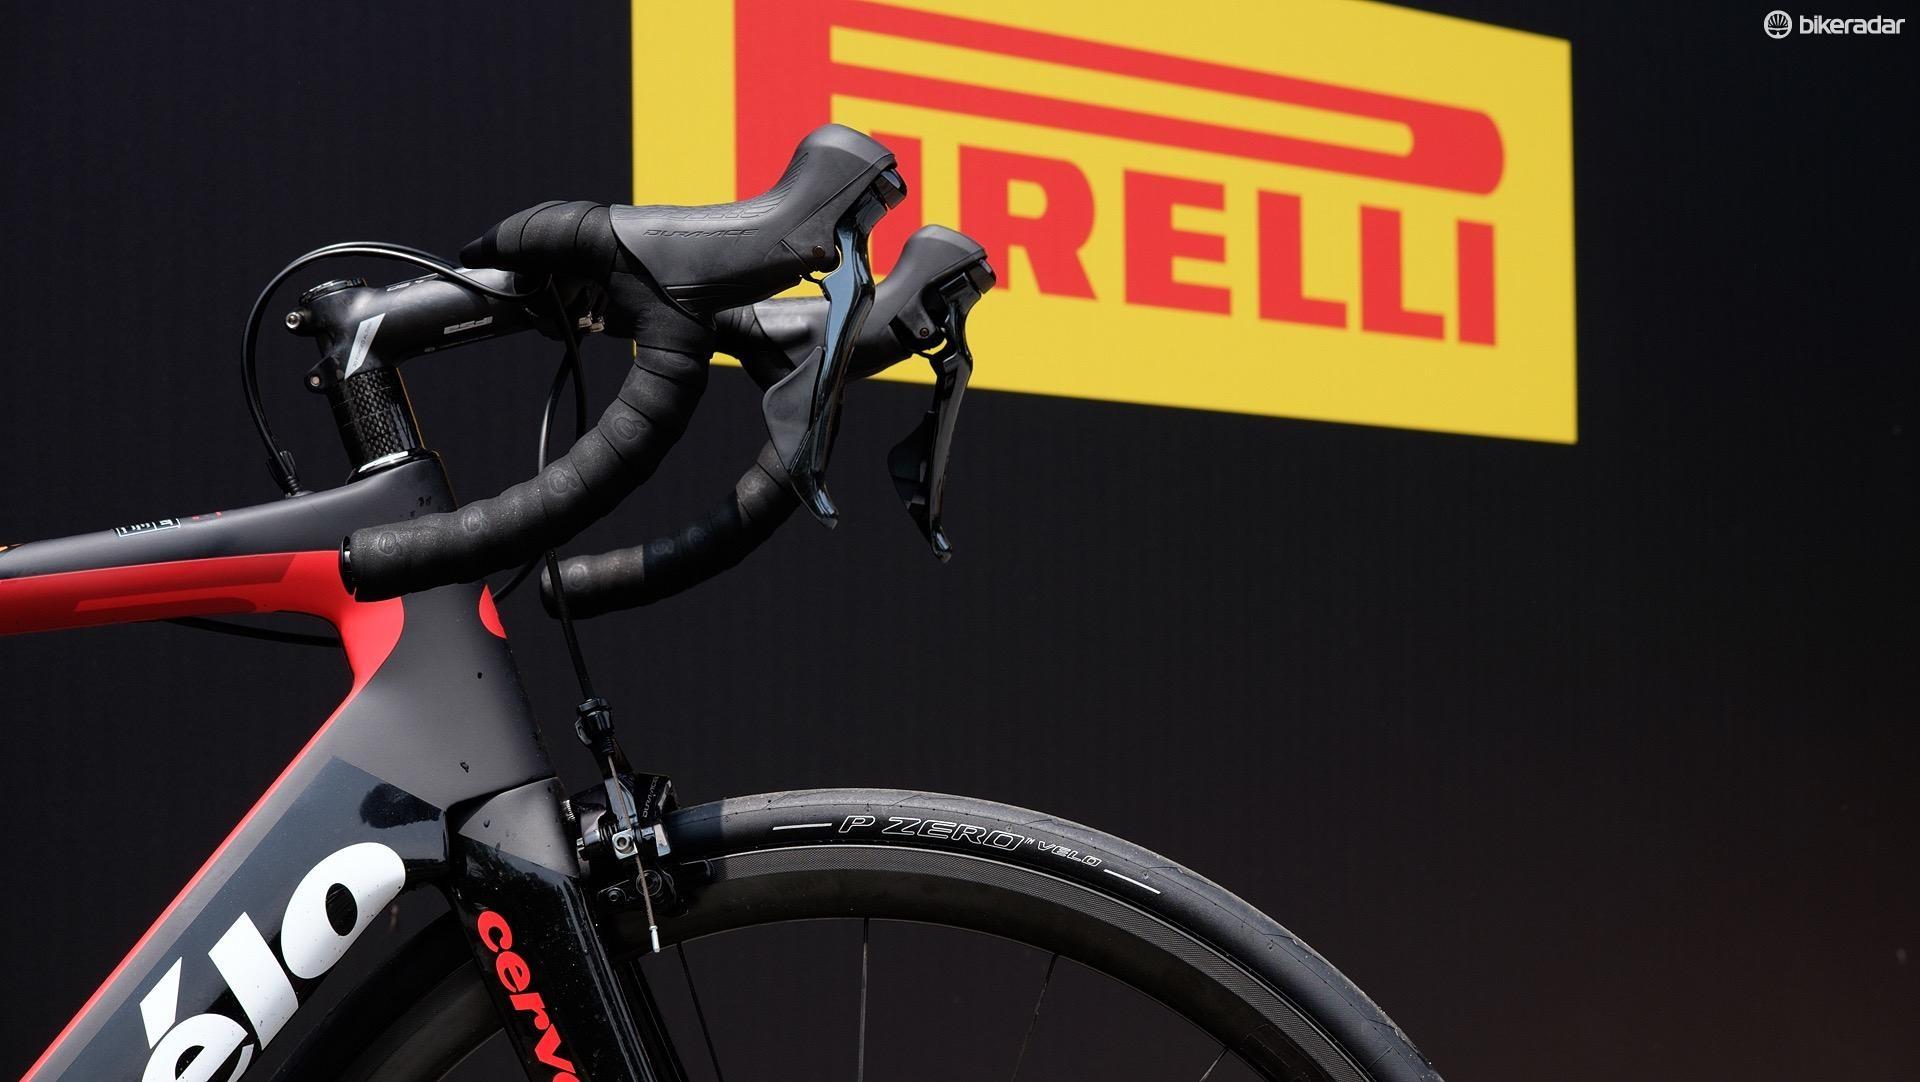 Pirelli says it has clocked over 100,000km in real world testing on its PZero Velo range